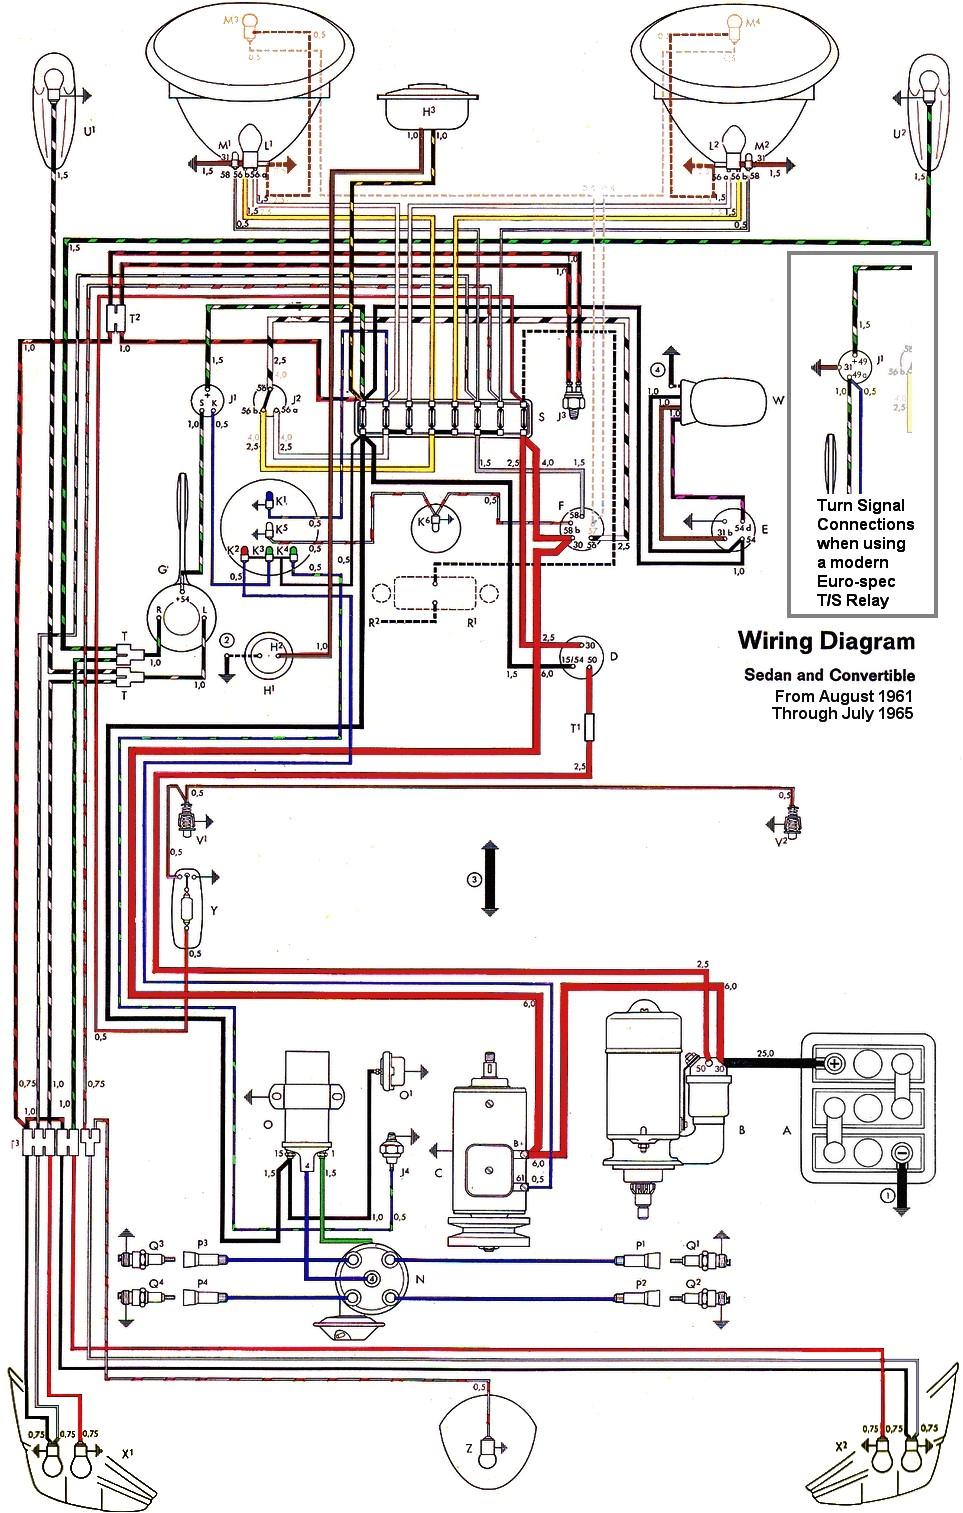 thesamba com type 1 wiring diagrams 72 super beetle wiring diagram super beetle wiring diagram